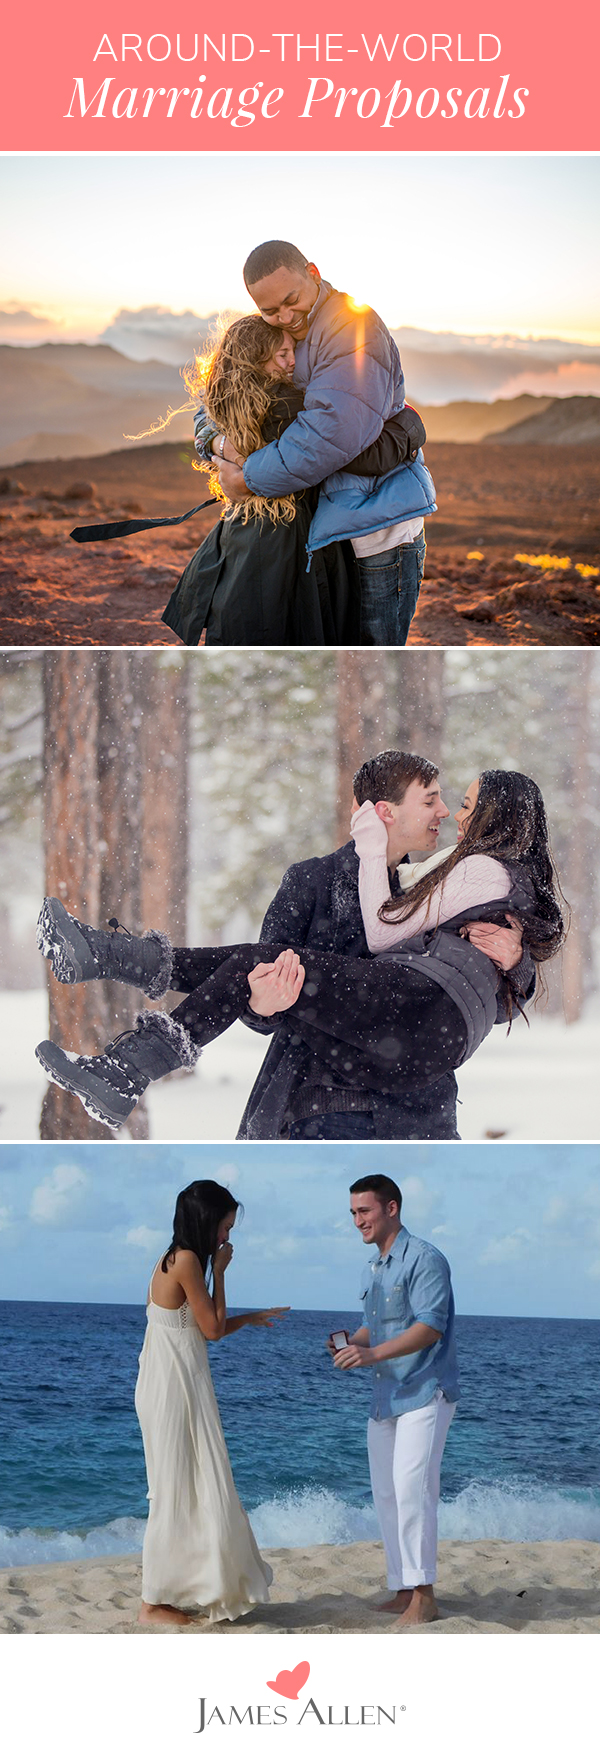 around-the-world marriage proposals pinterest pin